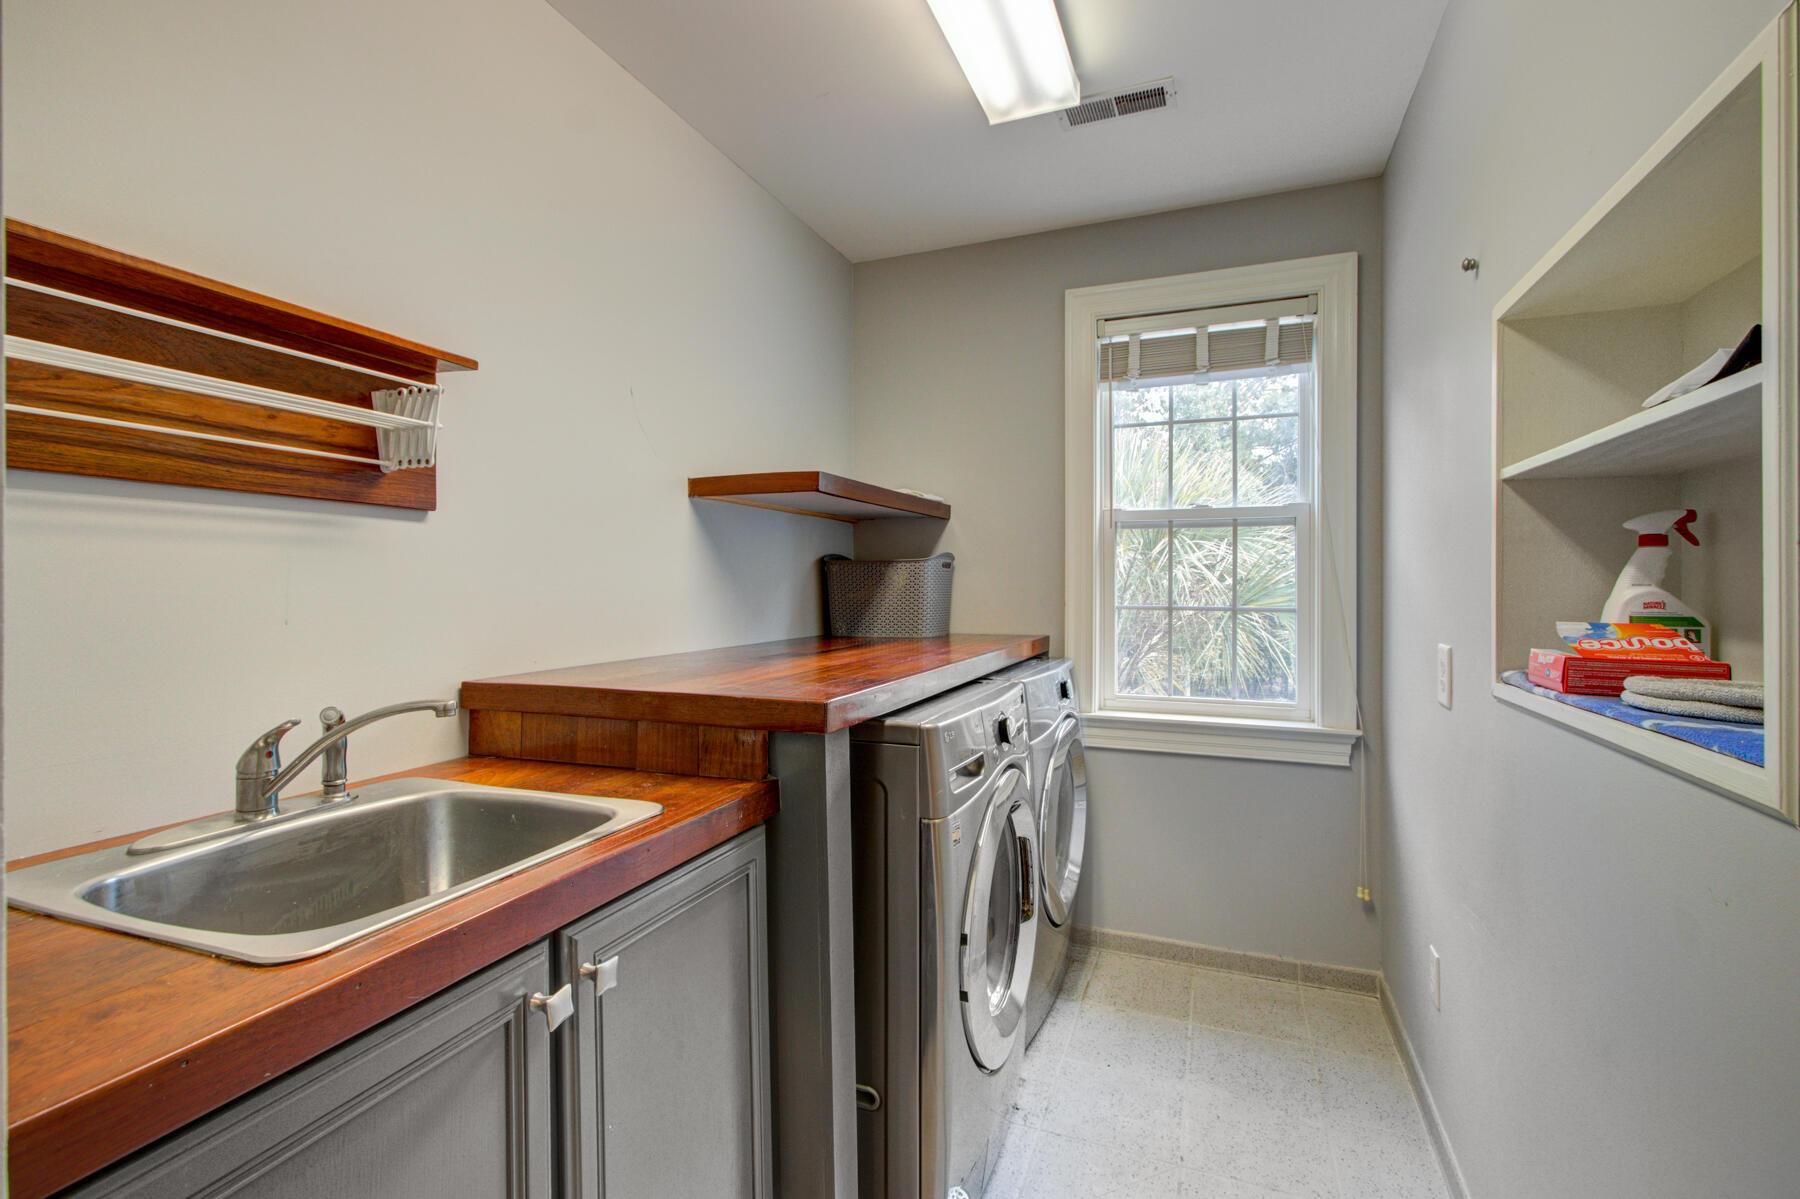 Dunes West Homes For Sale - 3095 Pignatelli, Mount Pleasant, SC - 24